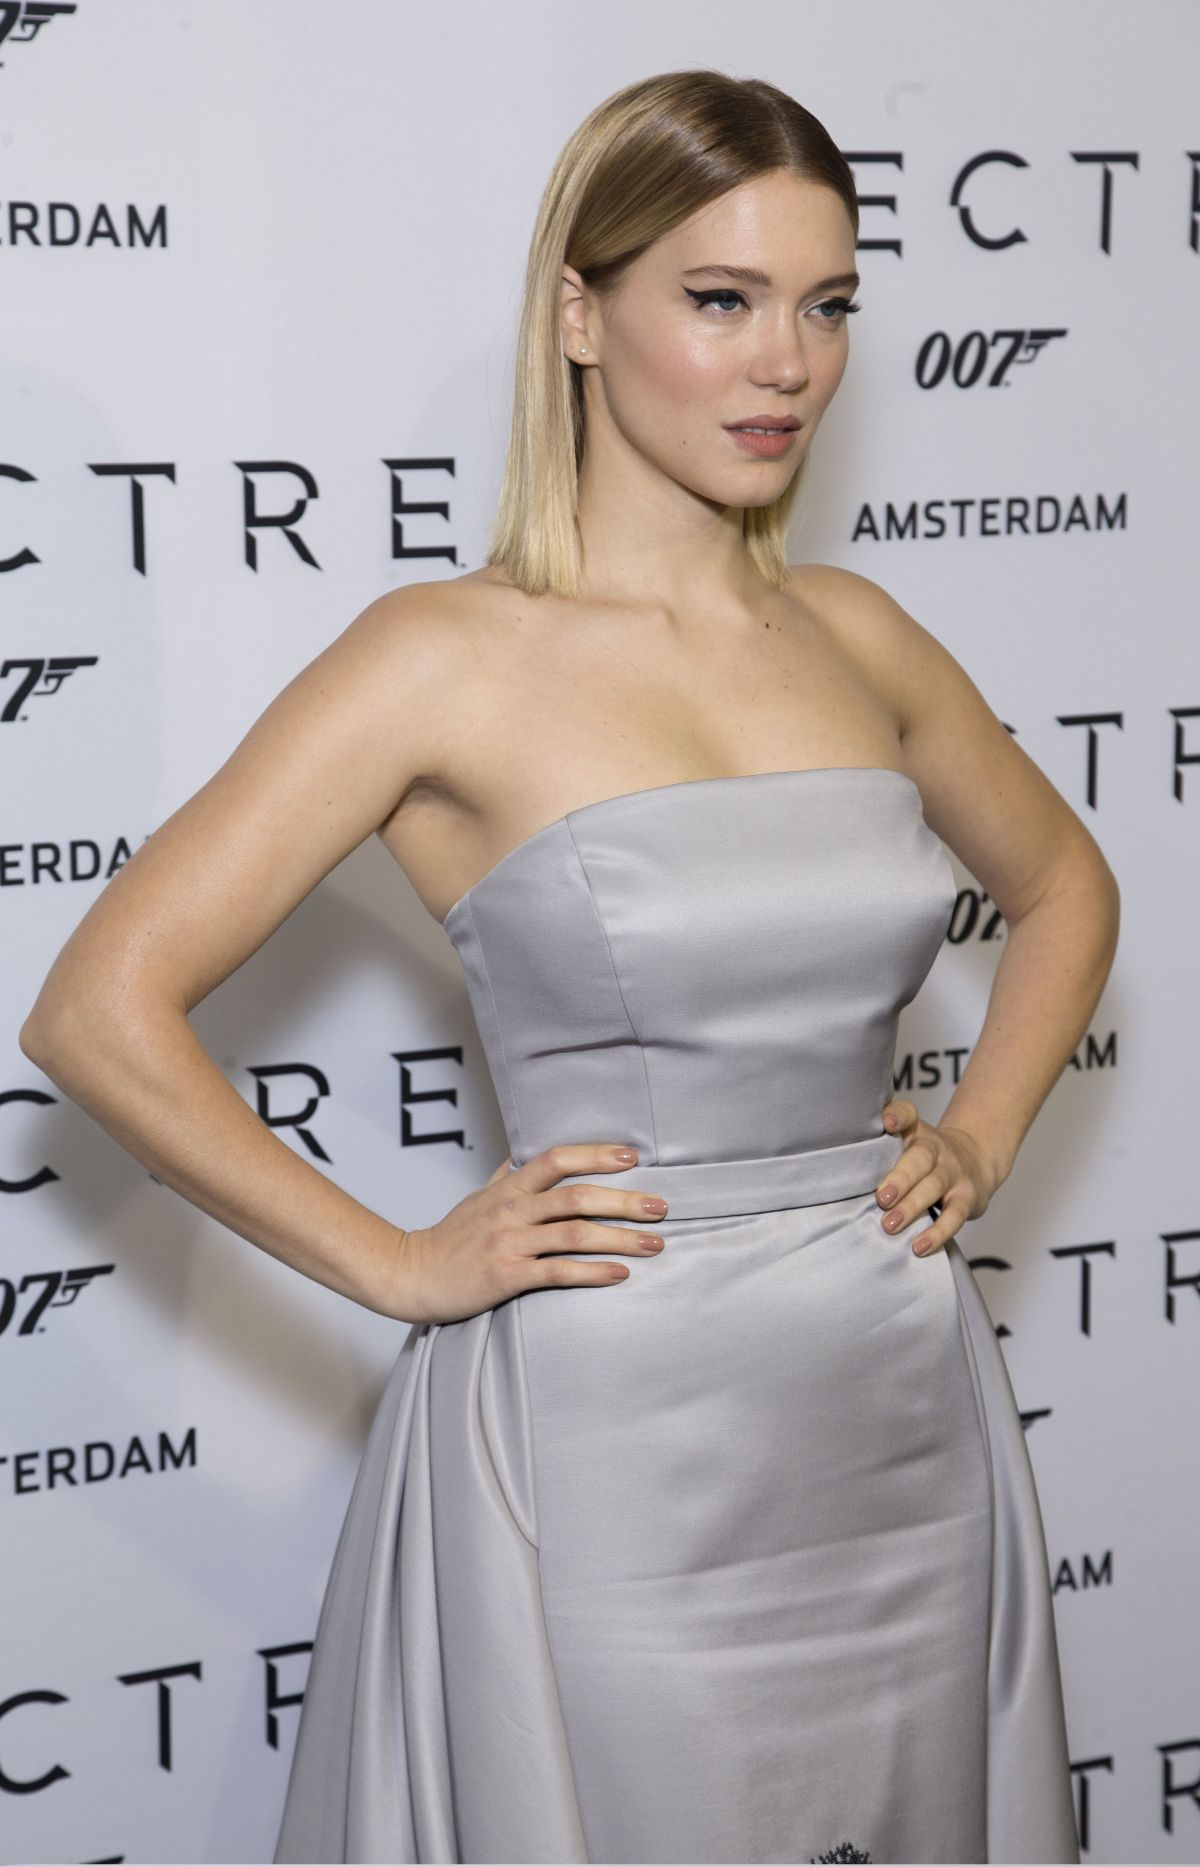 Lea Seydoux In Elle Magazine France February 2014 Issue: LEA SEYDOUX At Spectre Premiere In Amsterdam 10/27/2015